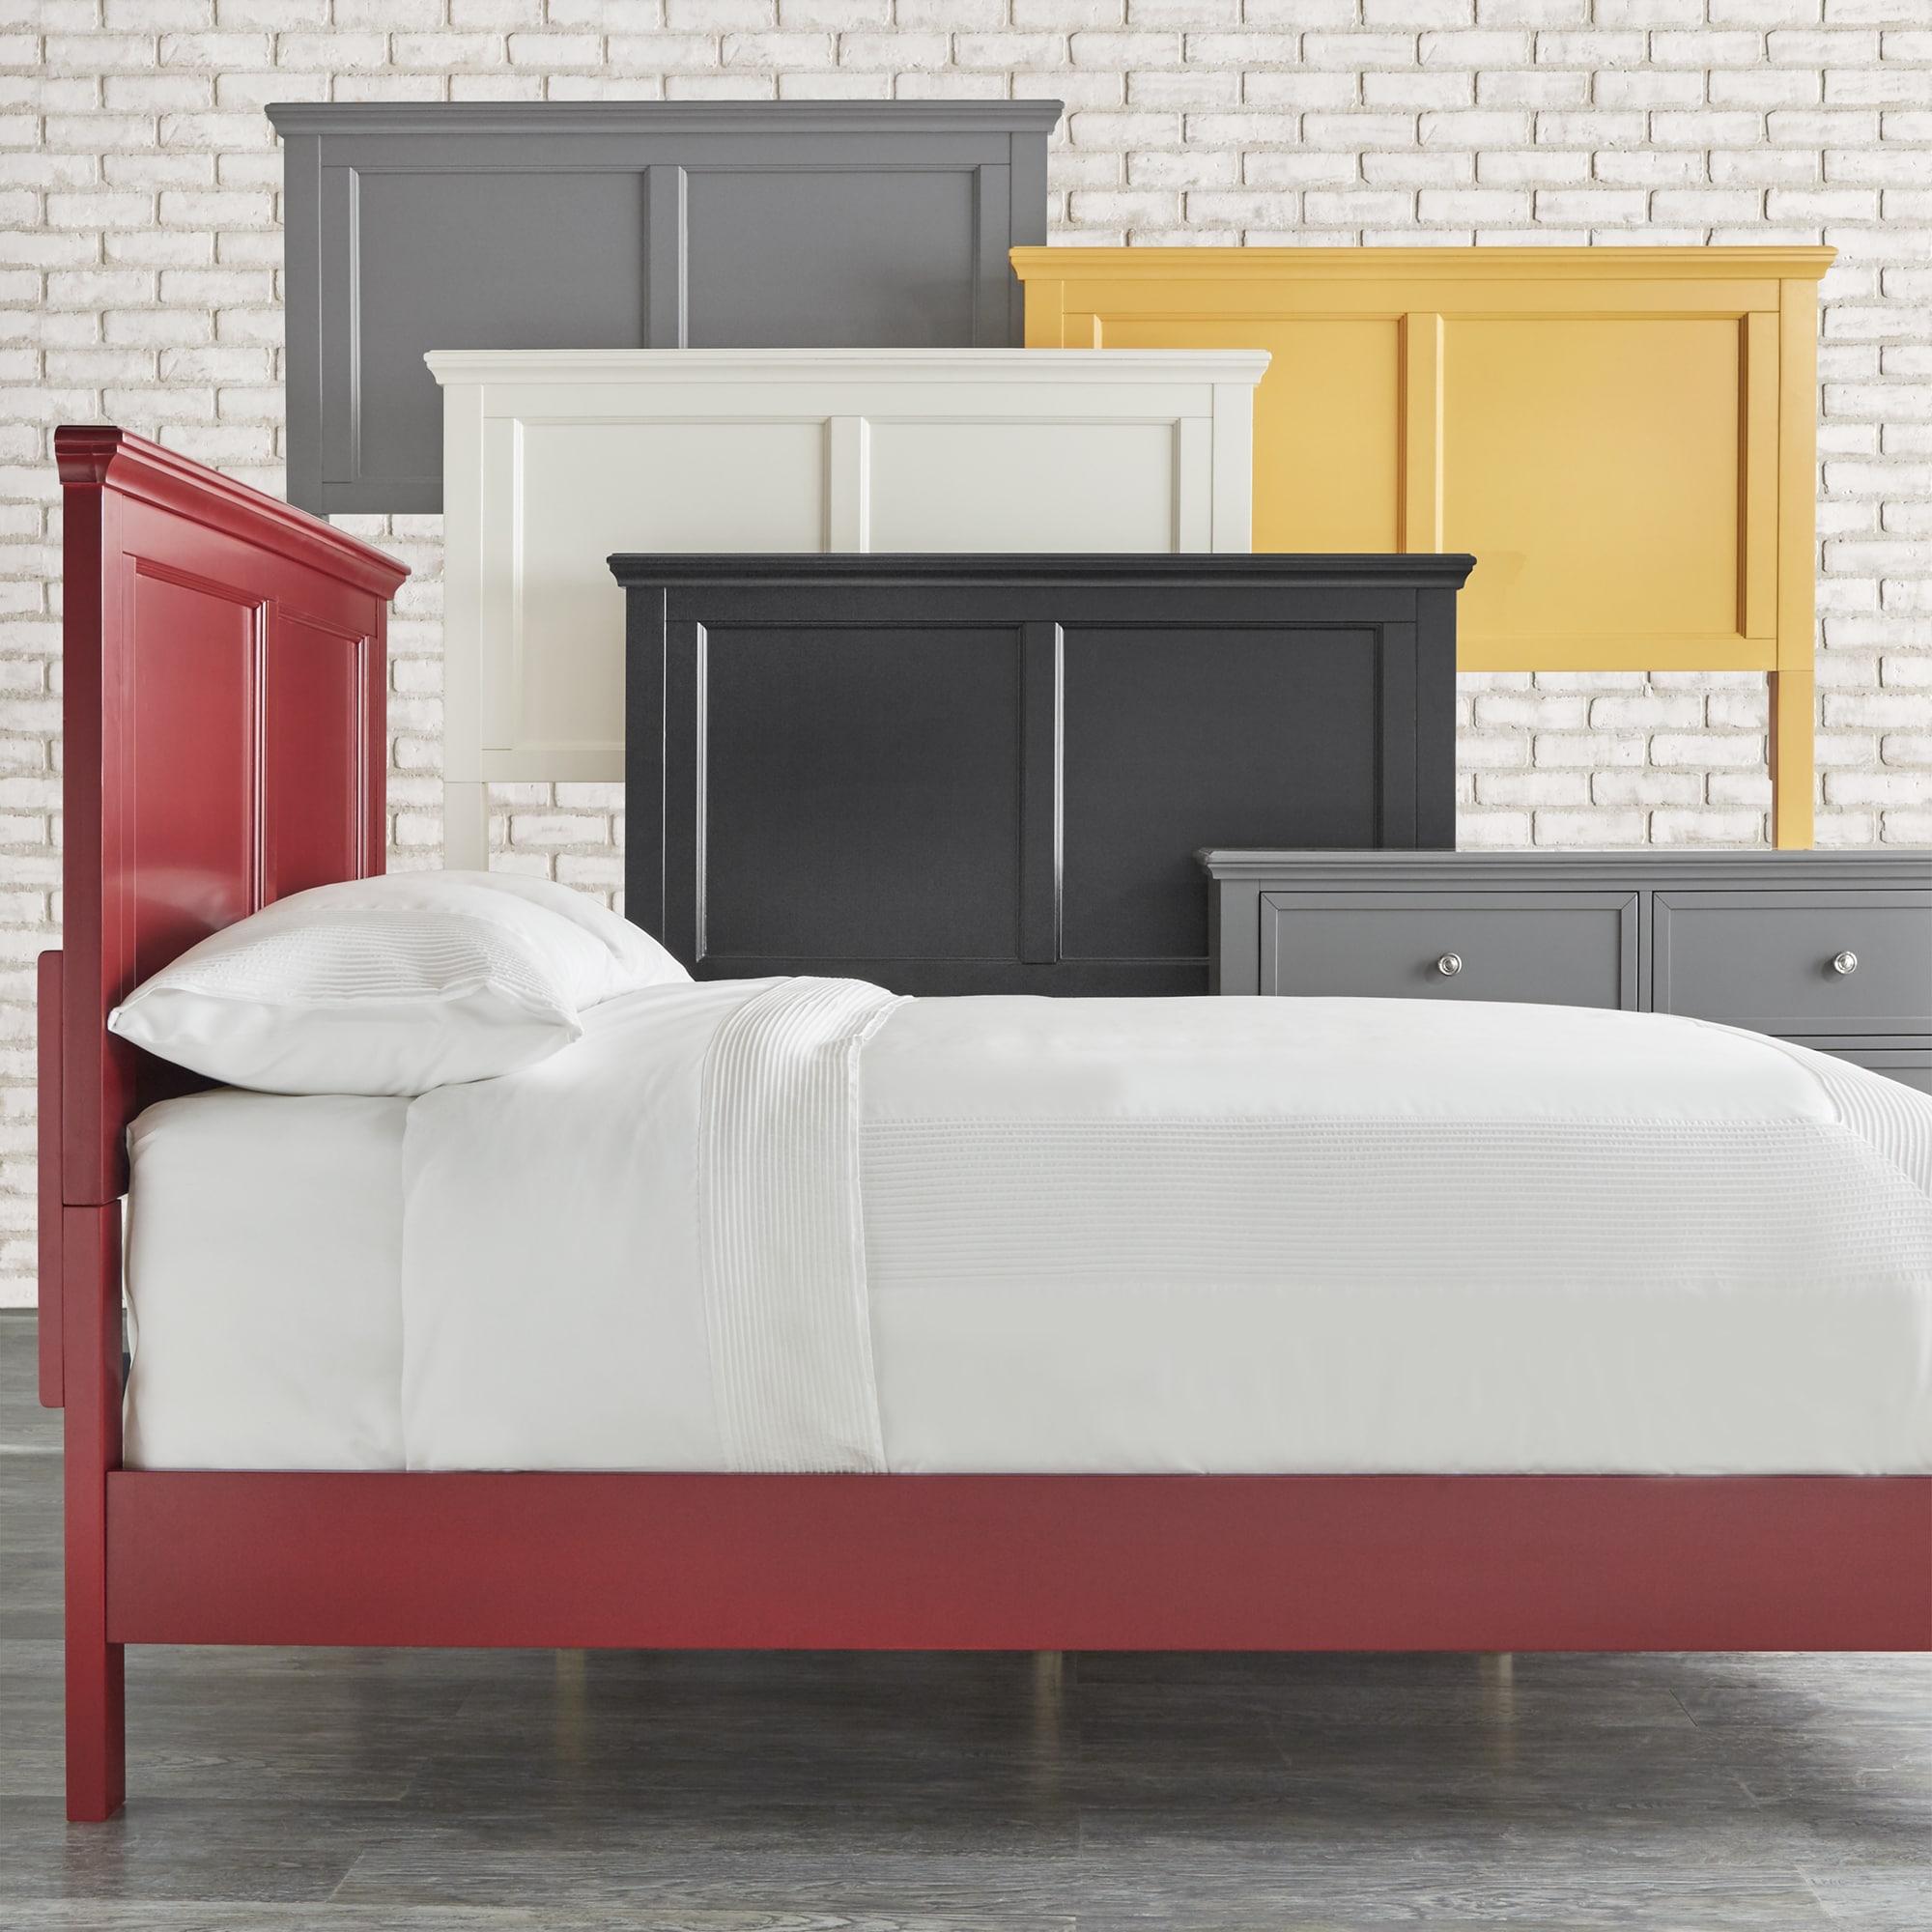 preston queen wood panel bed by inspire q junior ebay. Black Bedroom Furniture Sets. Home Design Ideas